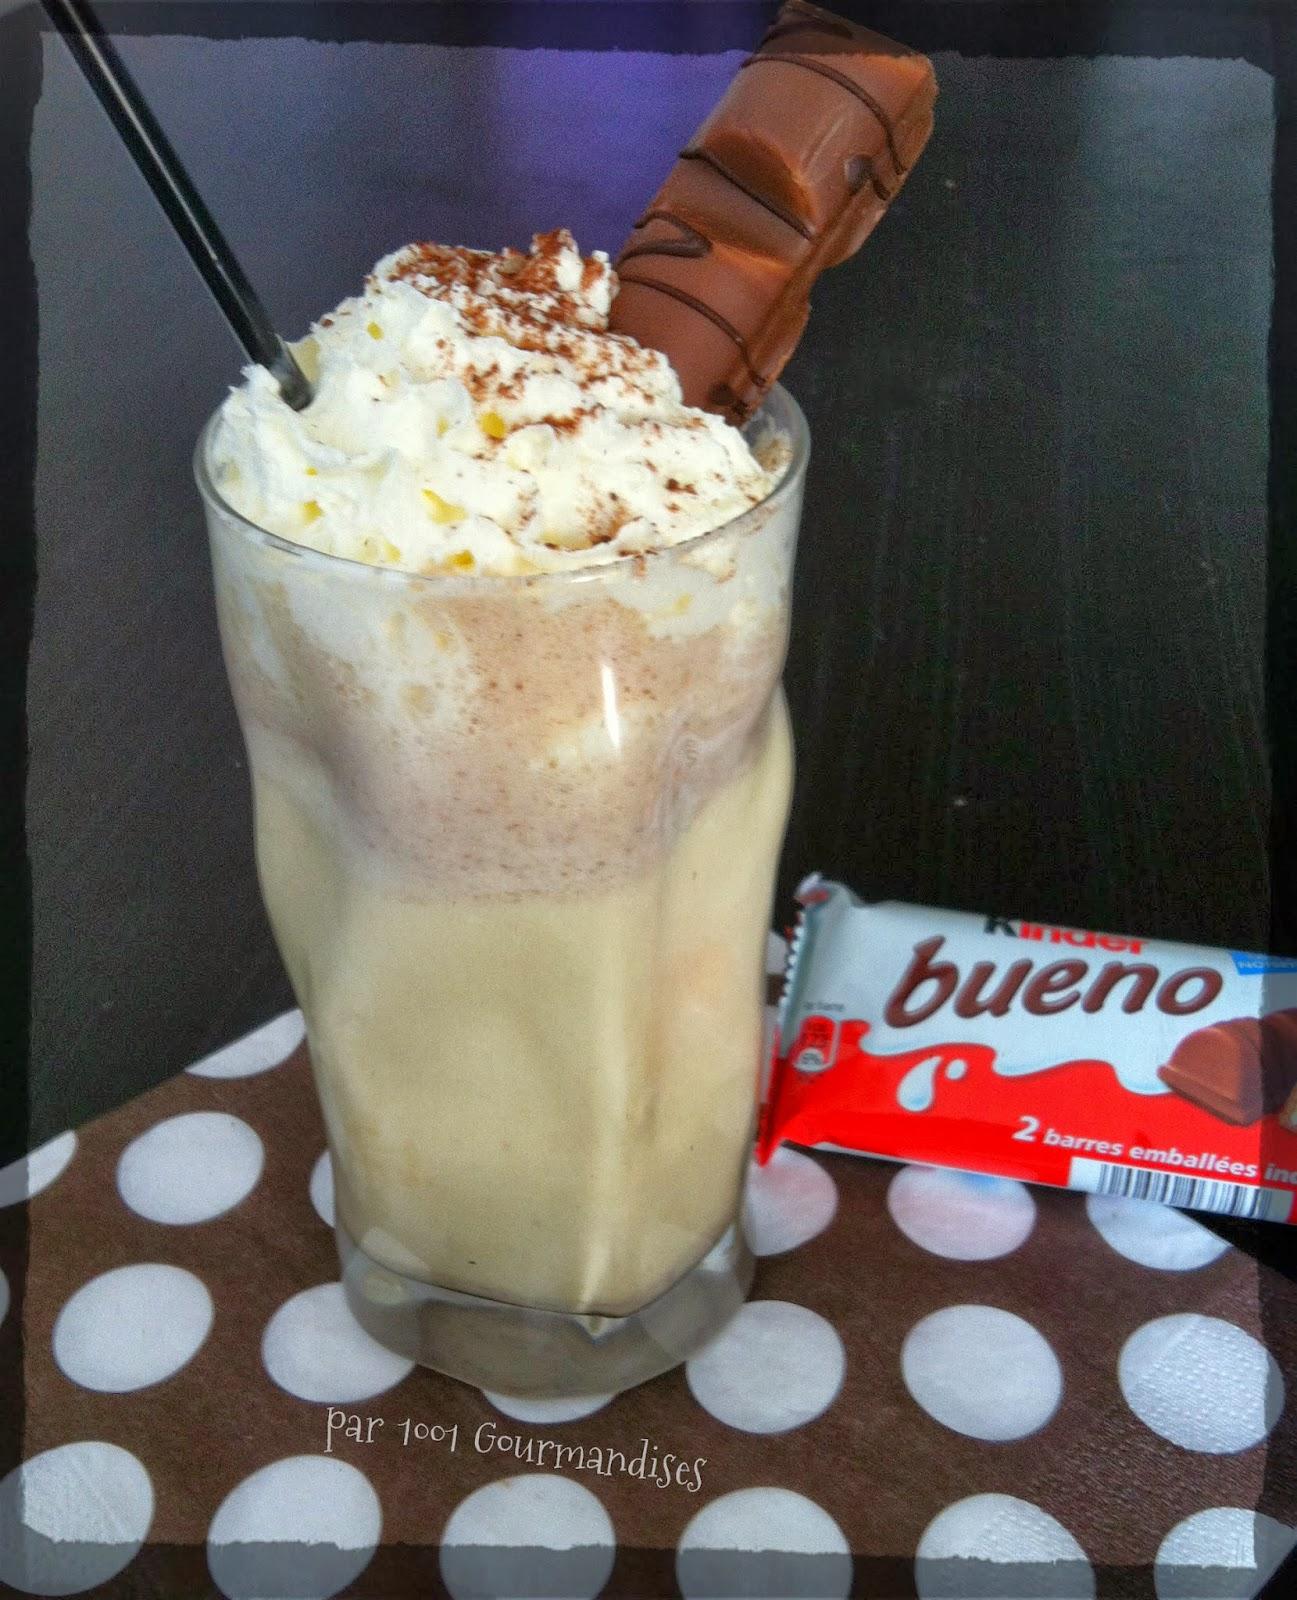 Populaire 1001 Gourmandises: Milk-shake kinder bueno MZ92